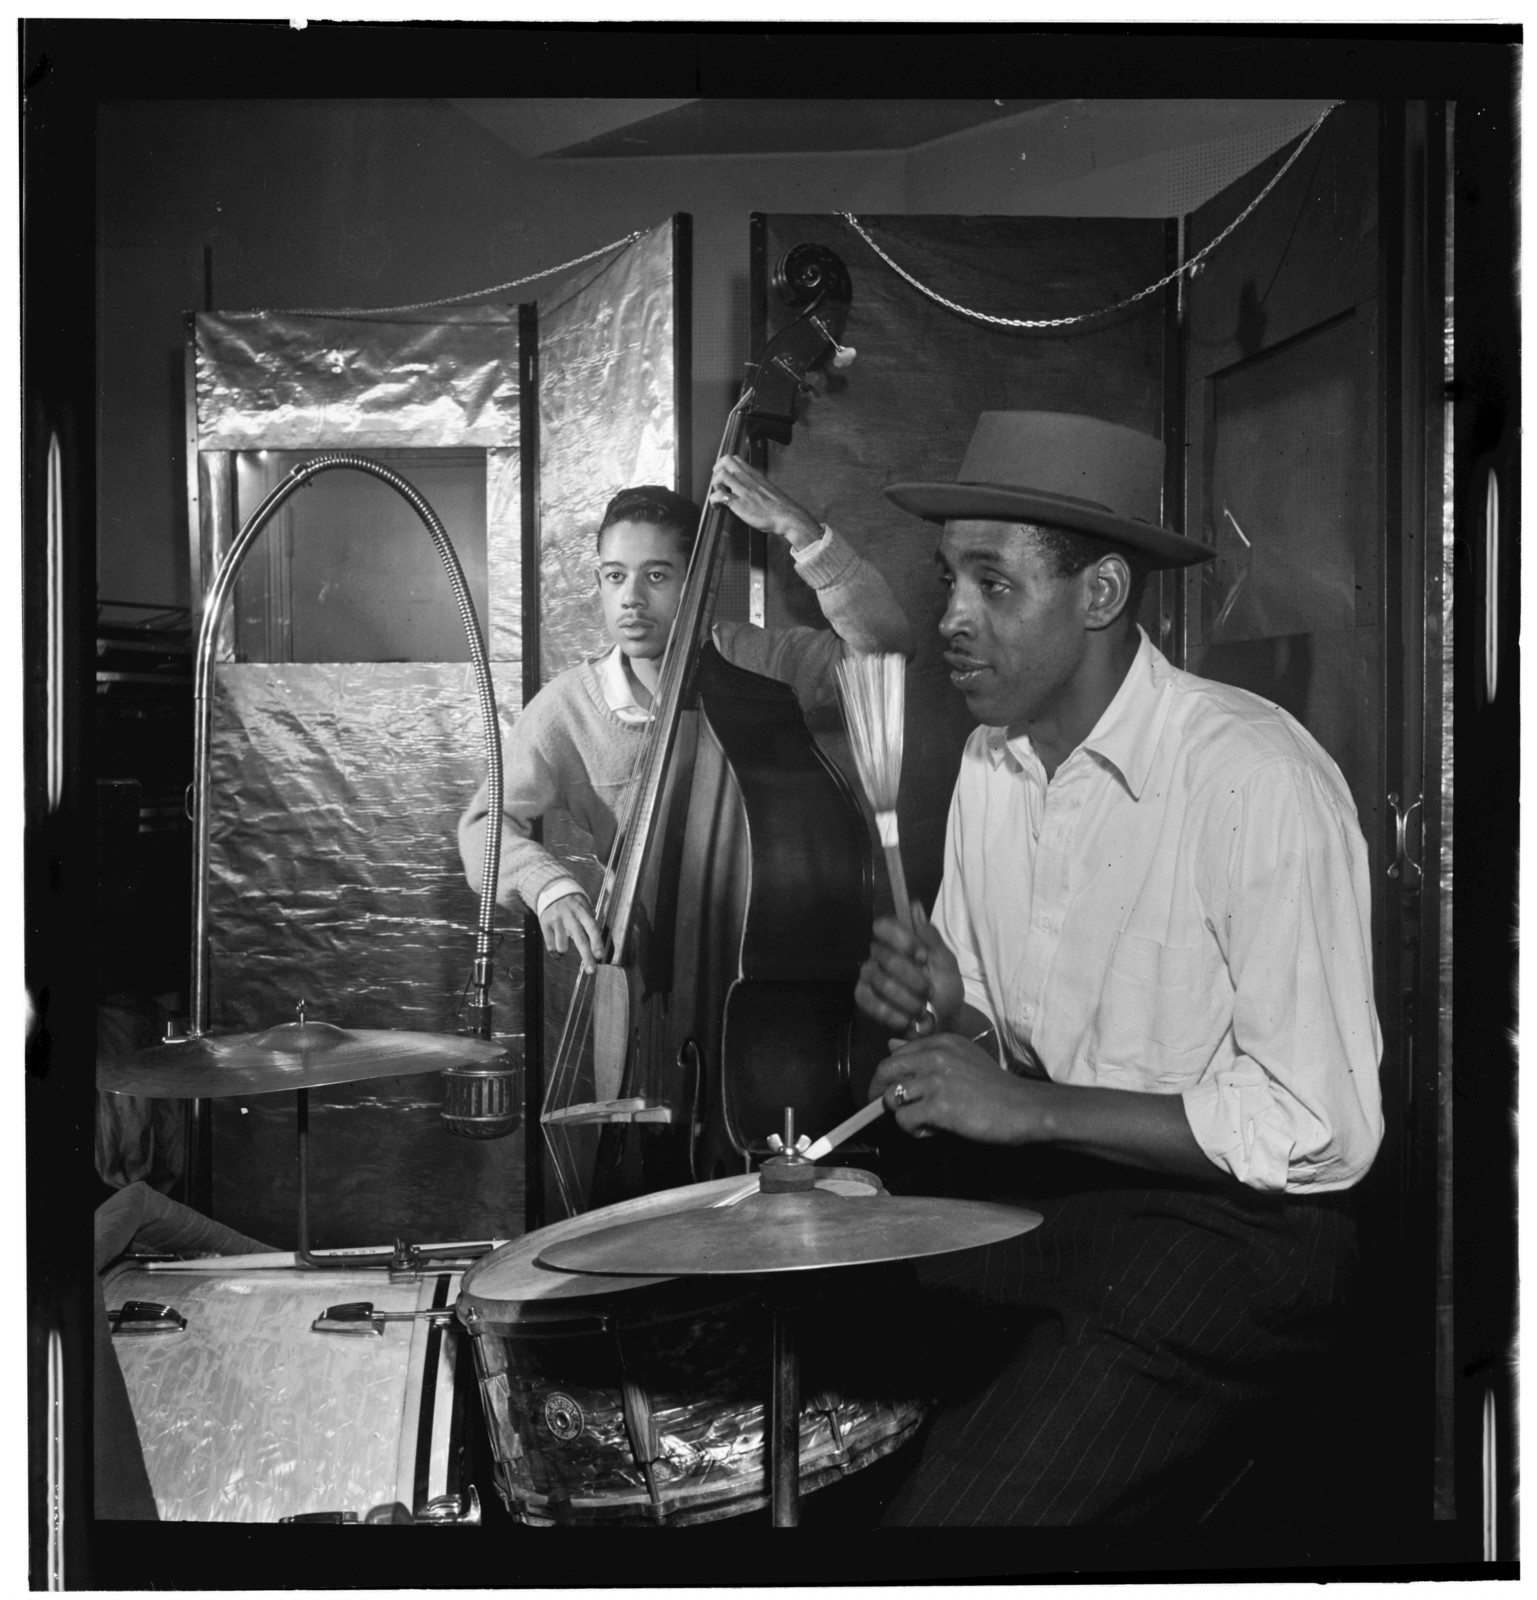 [Portrait of Shadow Wilson, New York, N.Y.(?), between 1938 and 1948]